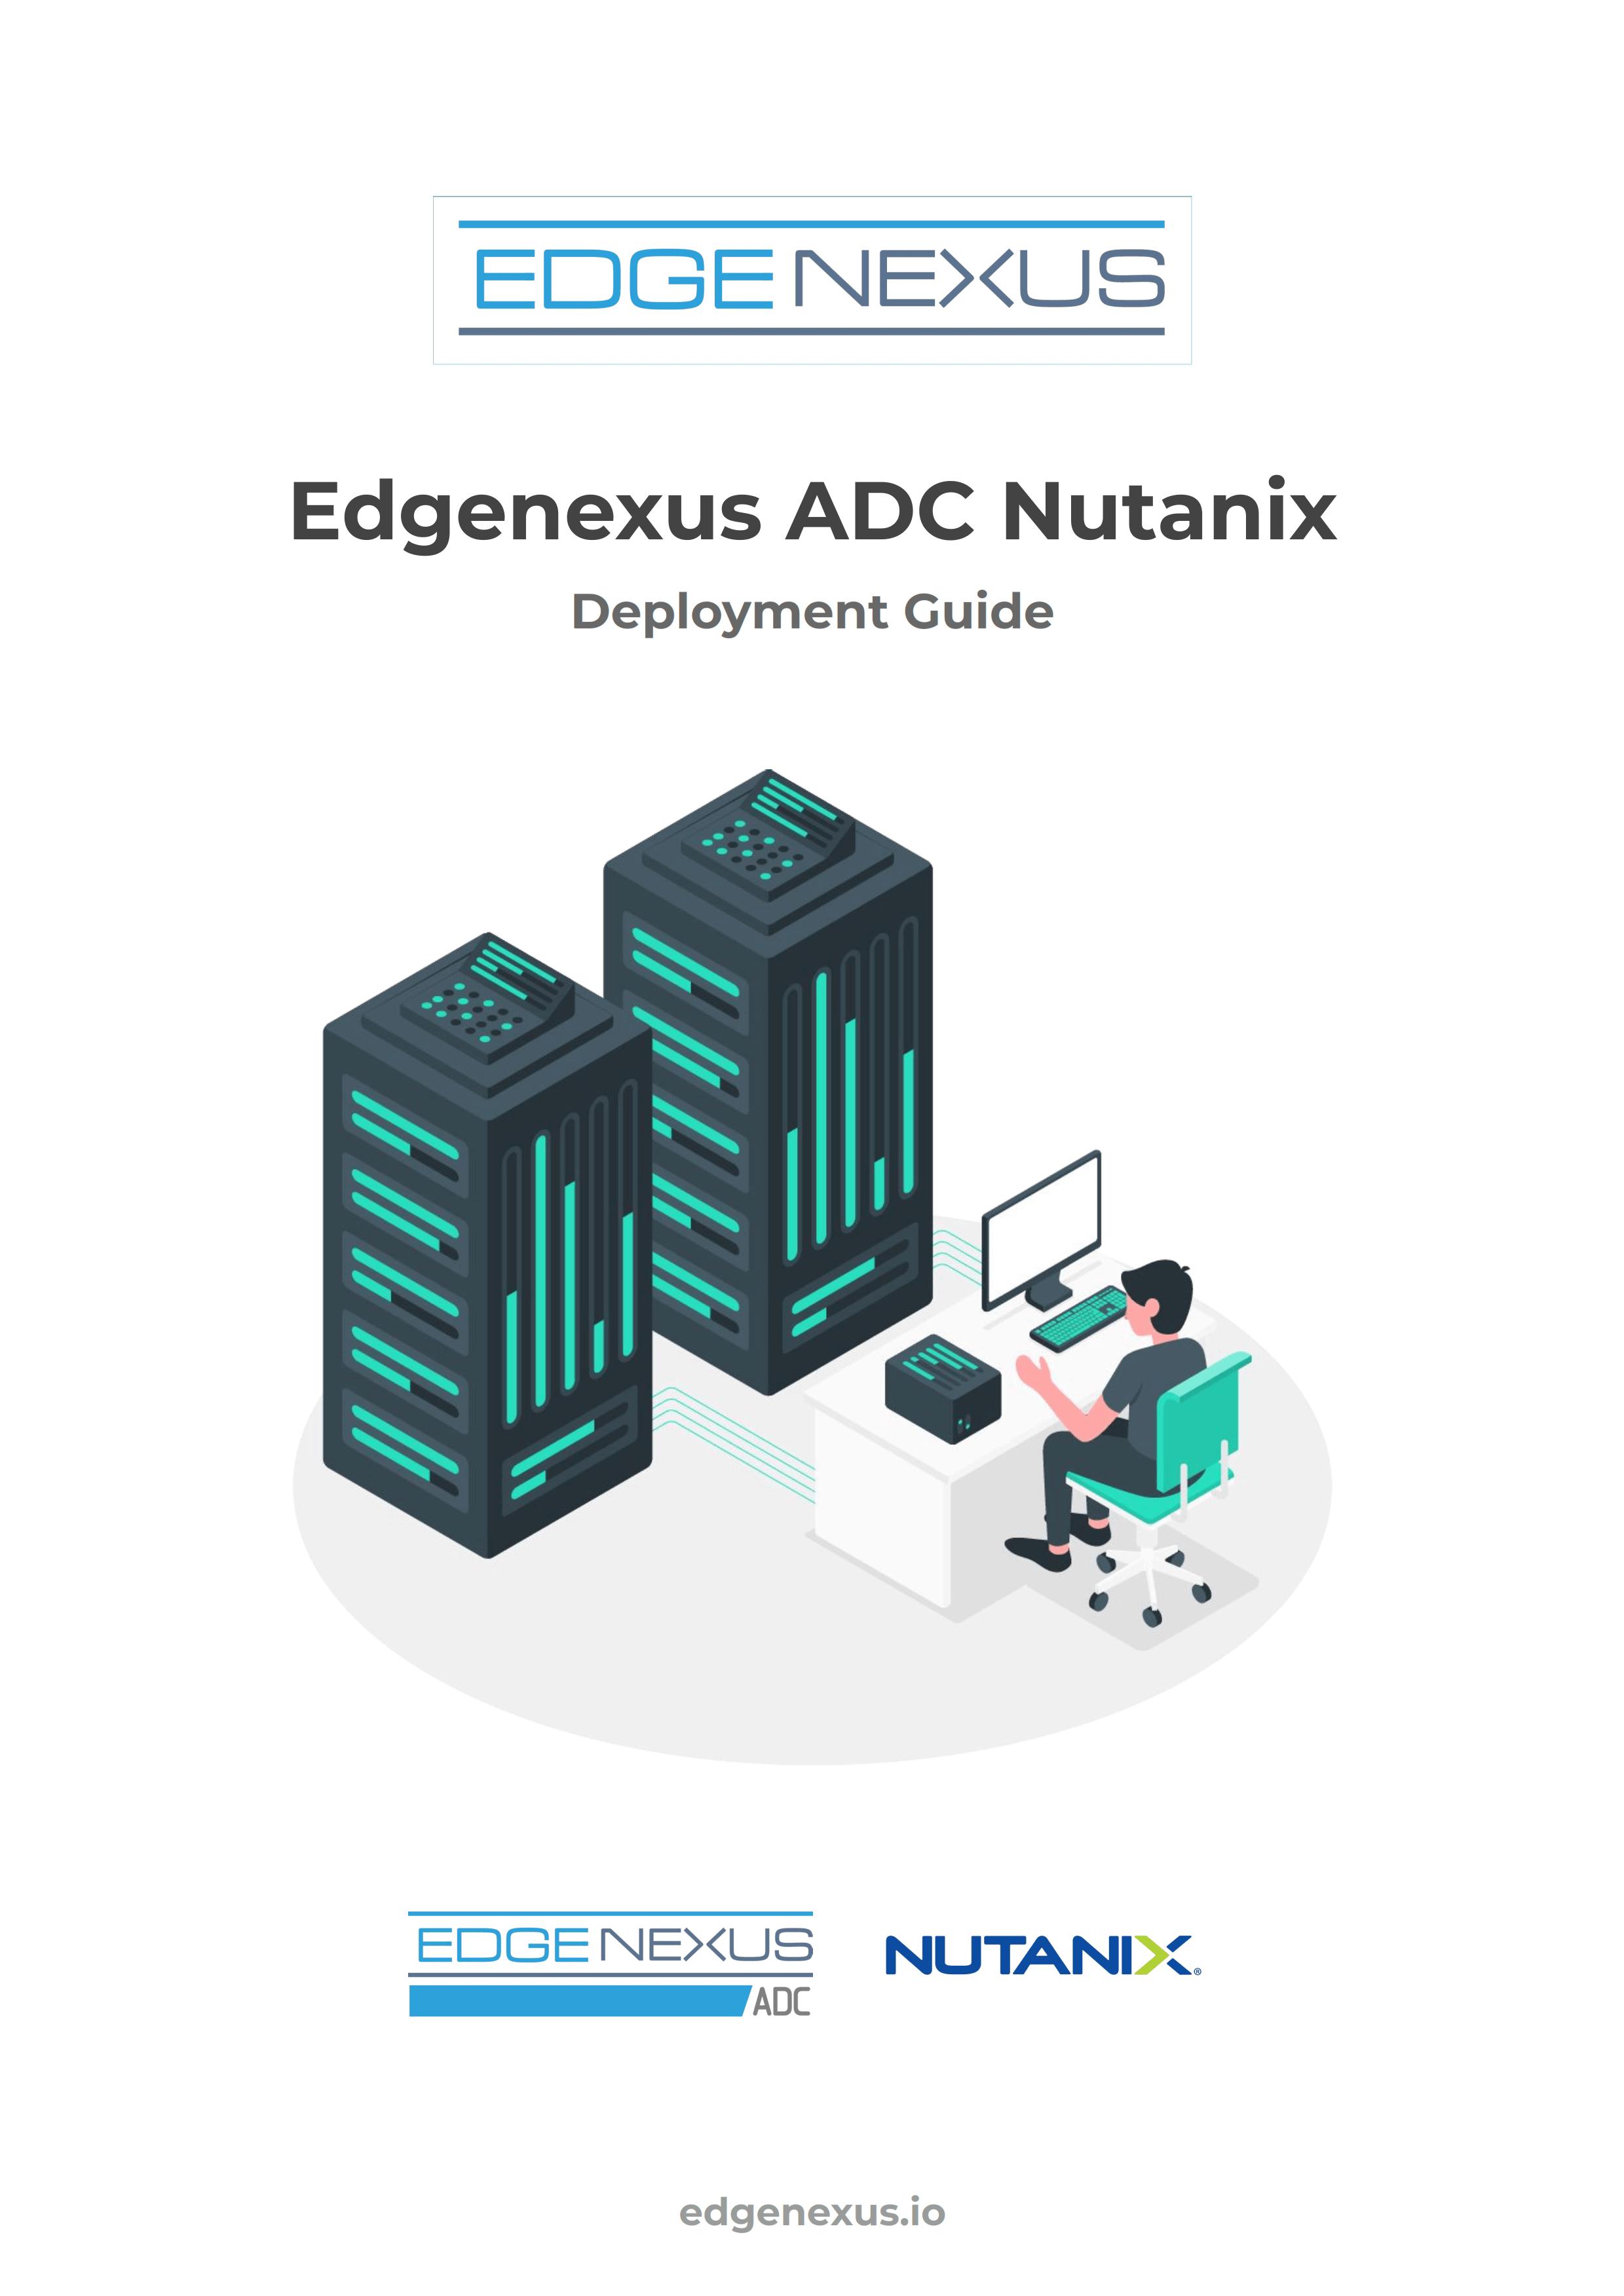 Edgenexus_Nutanix_Deployment_Guide_image